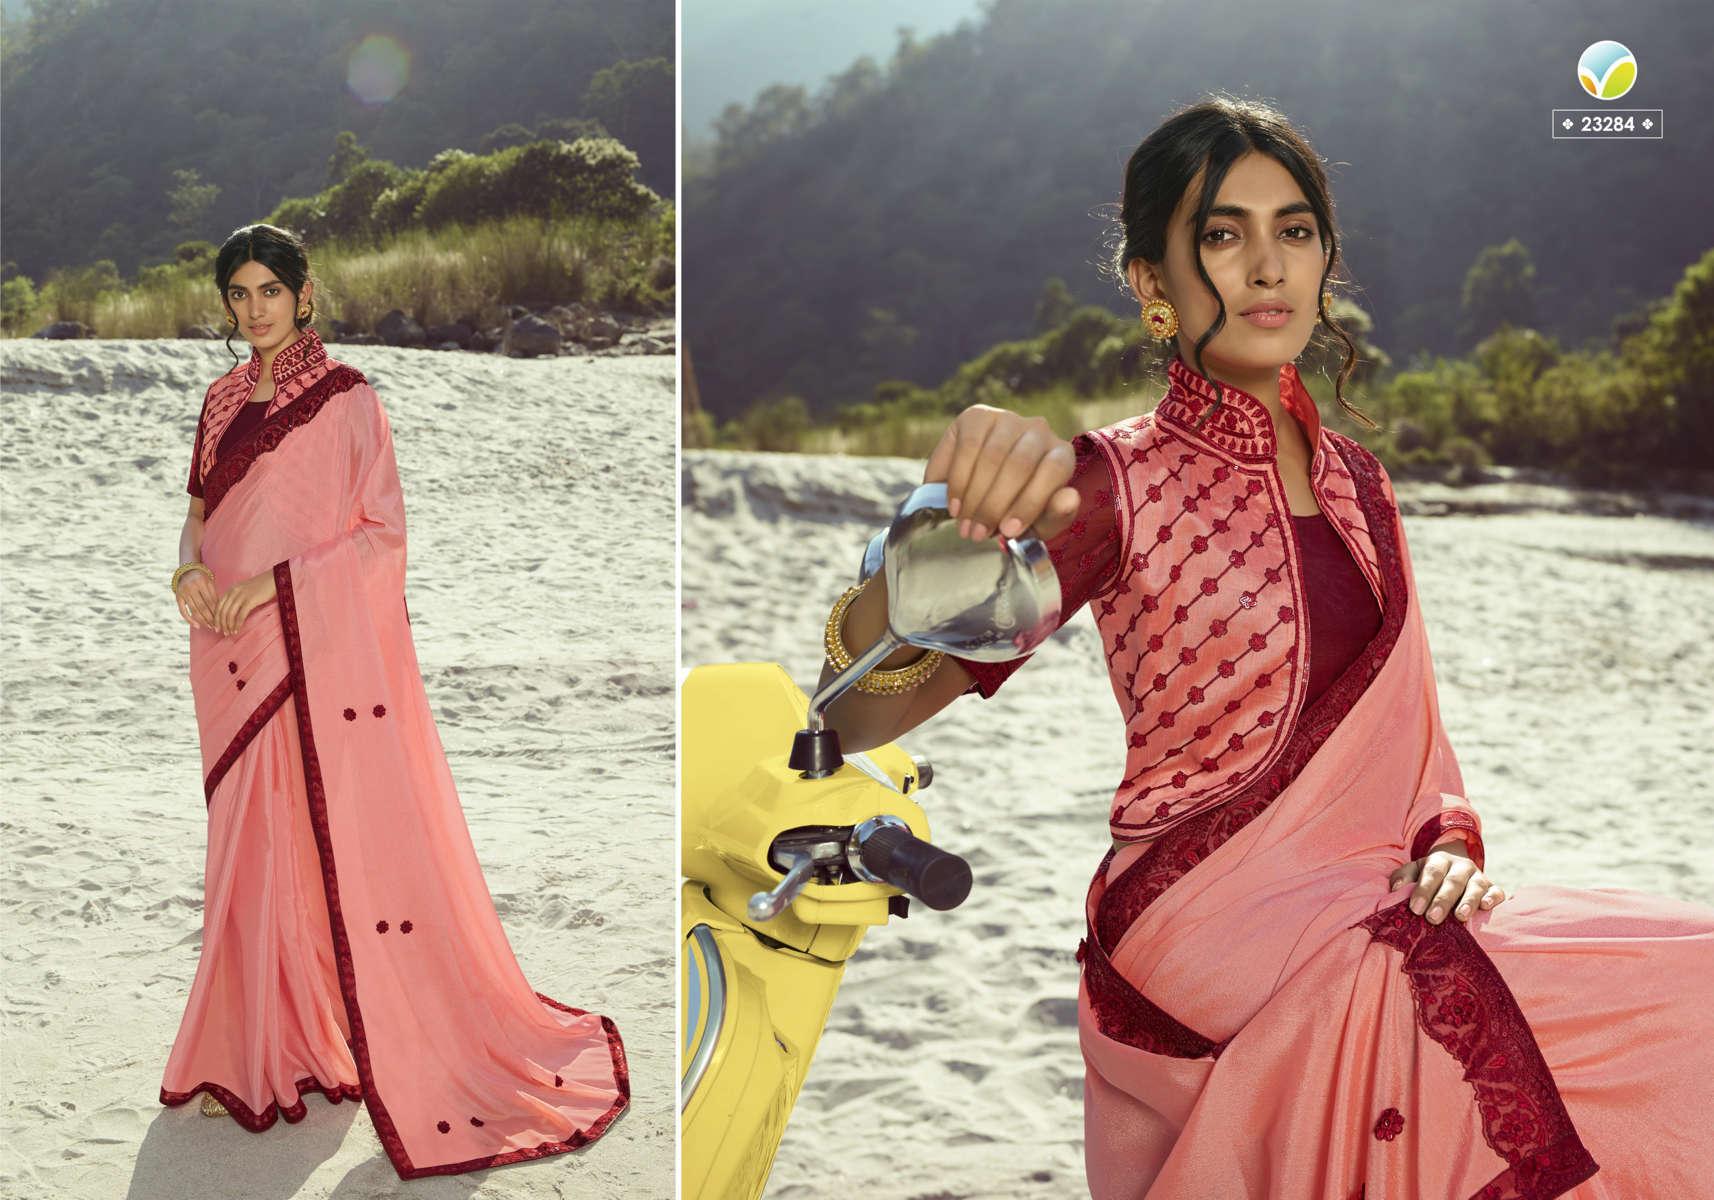 Vinay Sheesha Aafreen Vol 2 Saree Sari Wholesale Catalog 10 Pcs 5 1 - Vinay Sheesha Aafreen Vol 2 Saree Sari Wholesale Catalog 10 Pcs